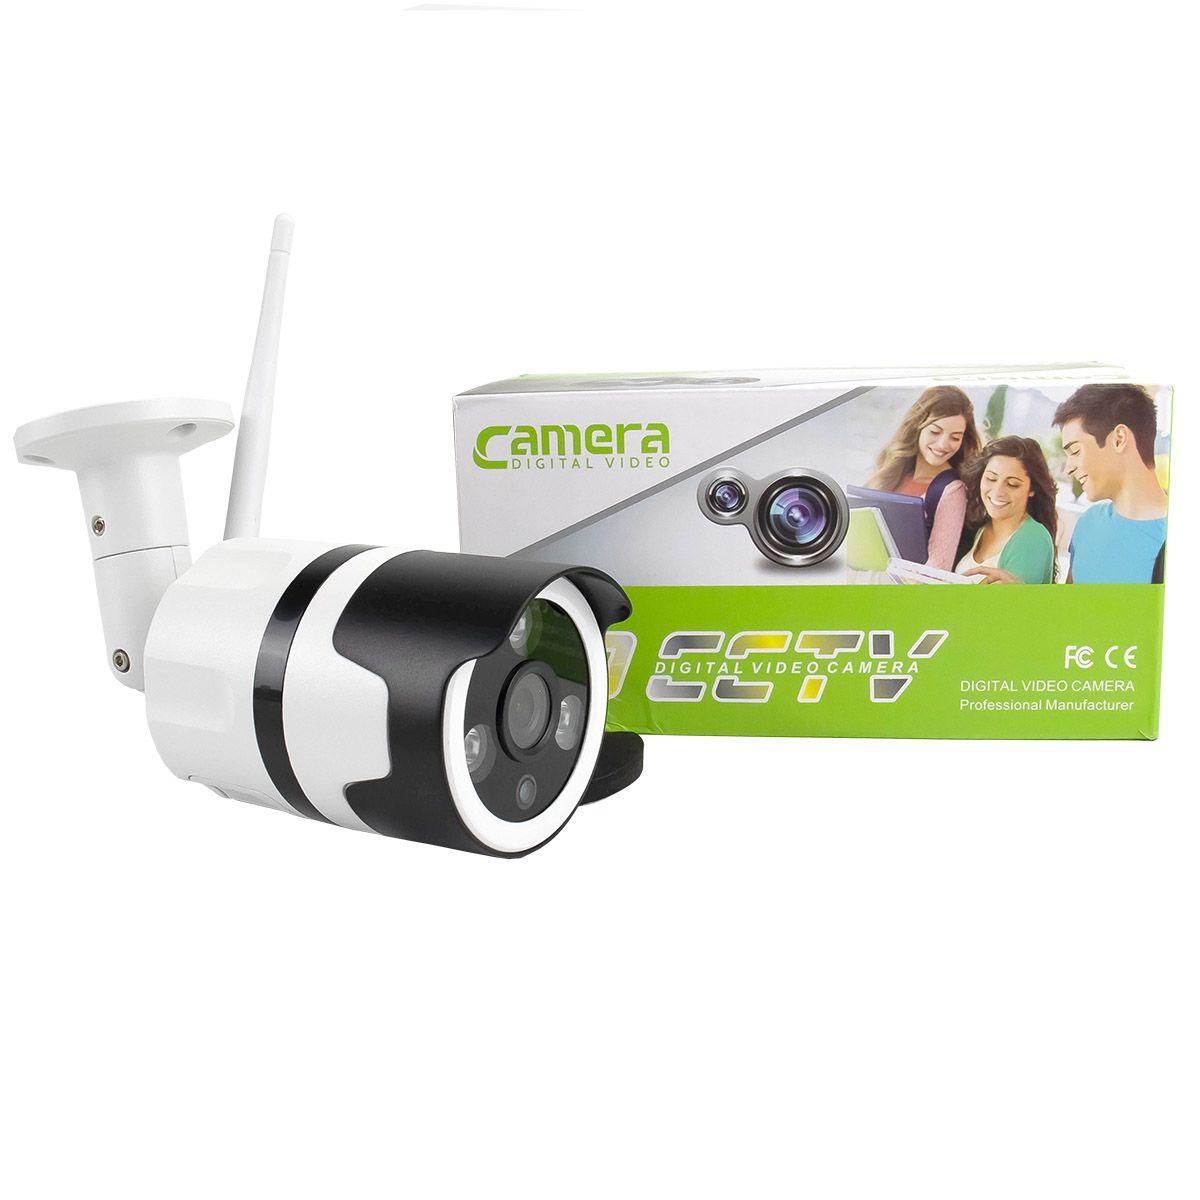 Câmera IP Digital Externa HD à Prova D'água com Visão Noturna 1920x1080 1.8MP-1F 3.6mm Lente XA-N632